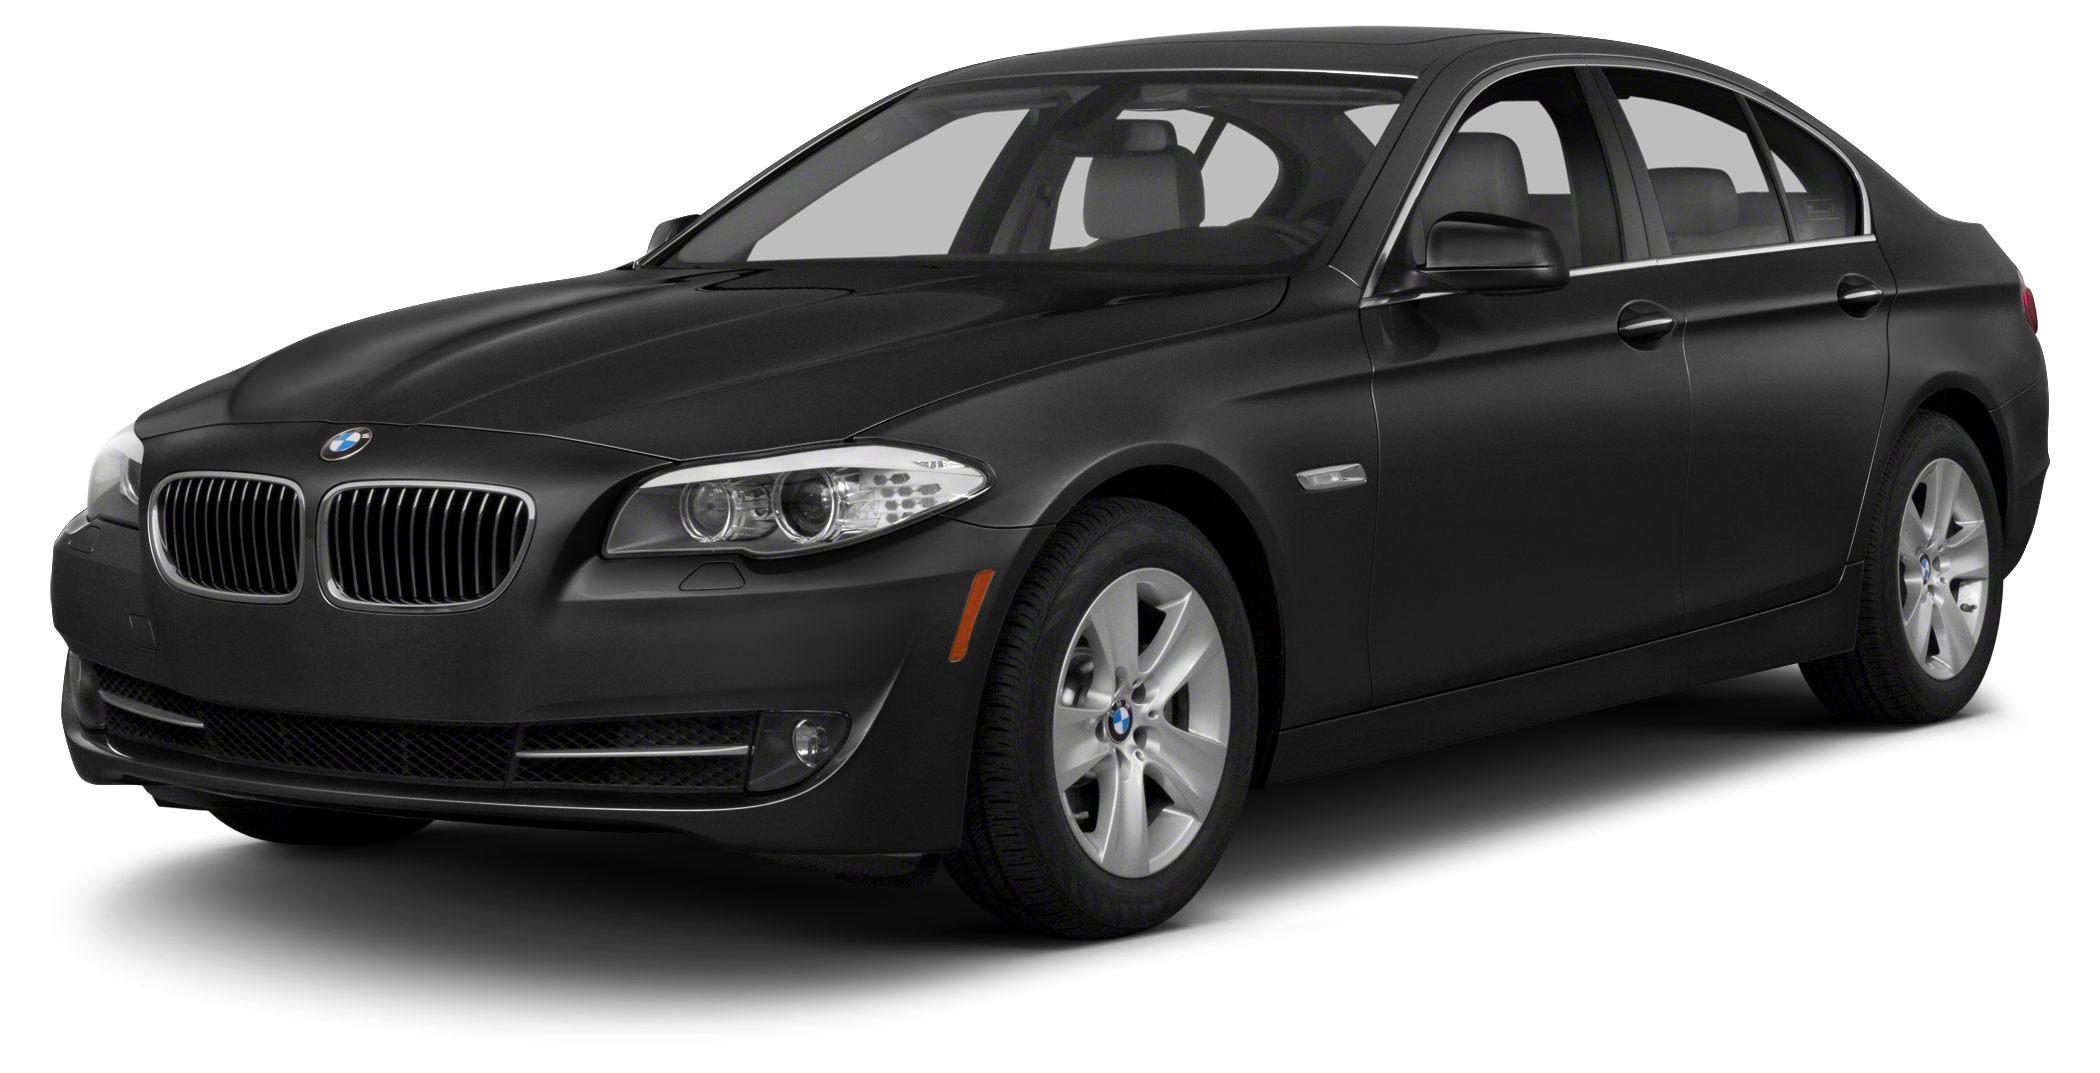 2013 BMW 5 Series 535i M SPORT NAVIGATION SPORT PACKAGE BLACK ON BLACK 535 THIS 535 HAS UPGRAD